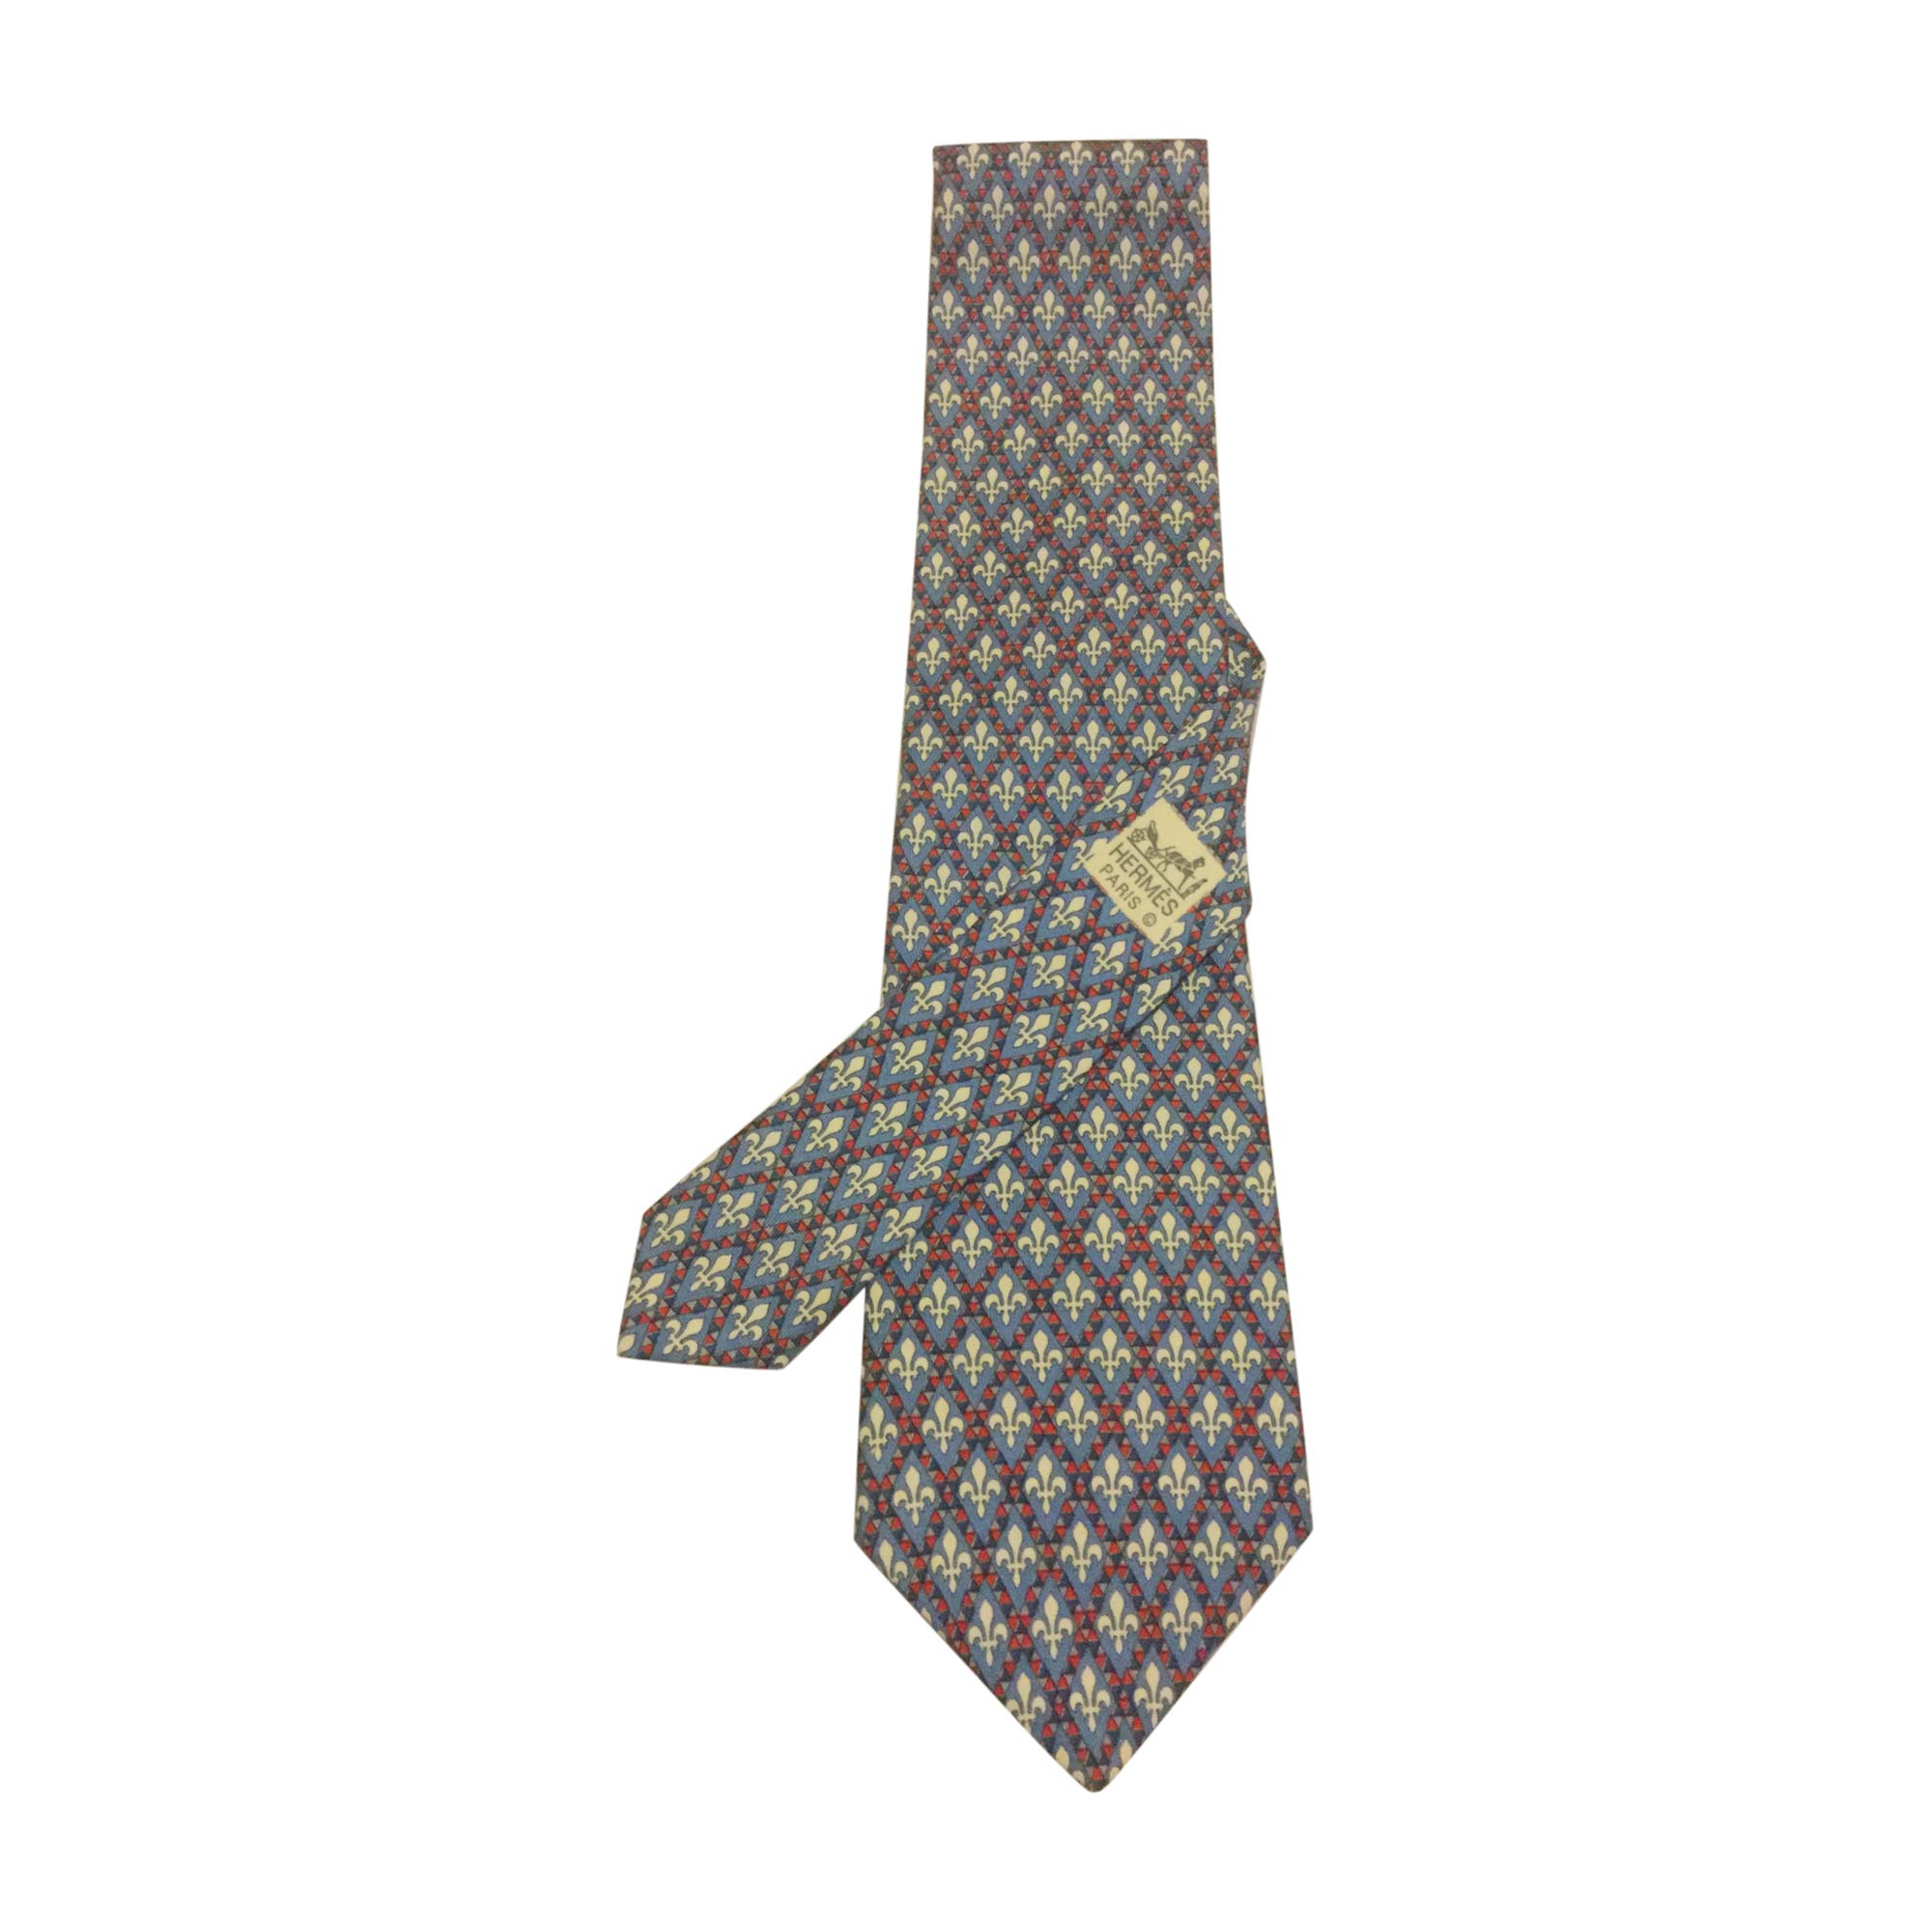 15e5b7a049f Cravate HERMÈS bleu vendu par Sheis94 - 7134051